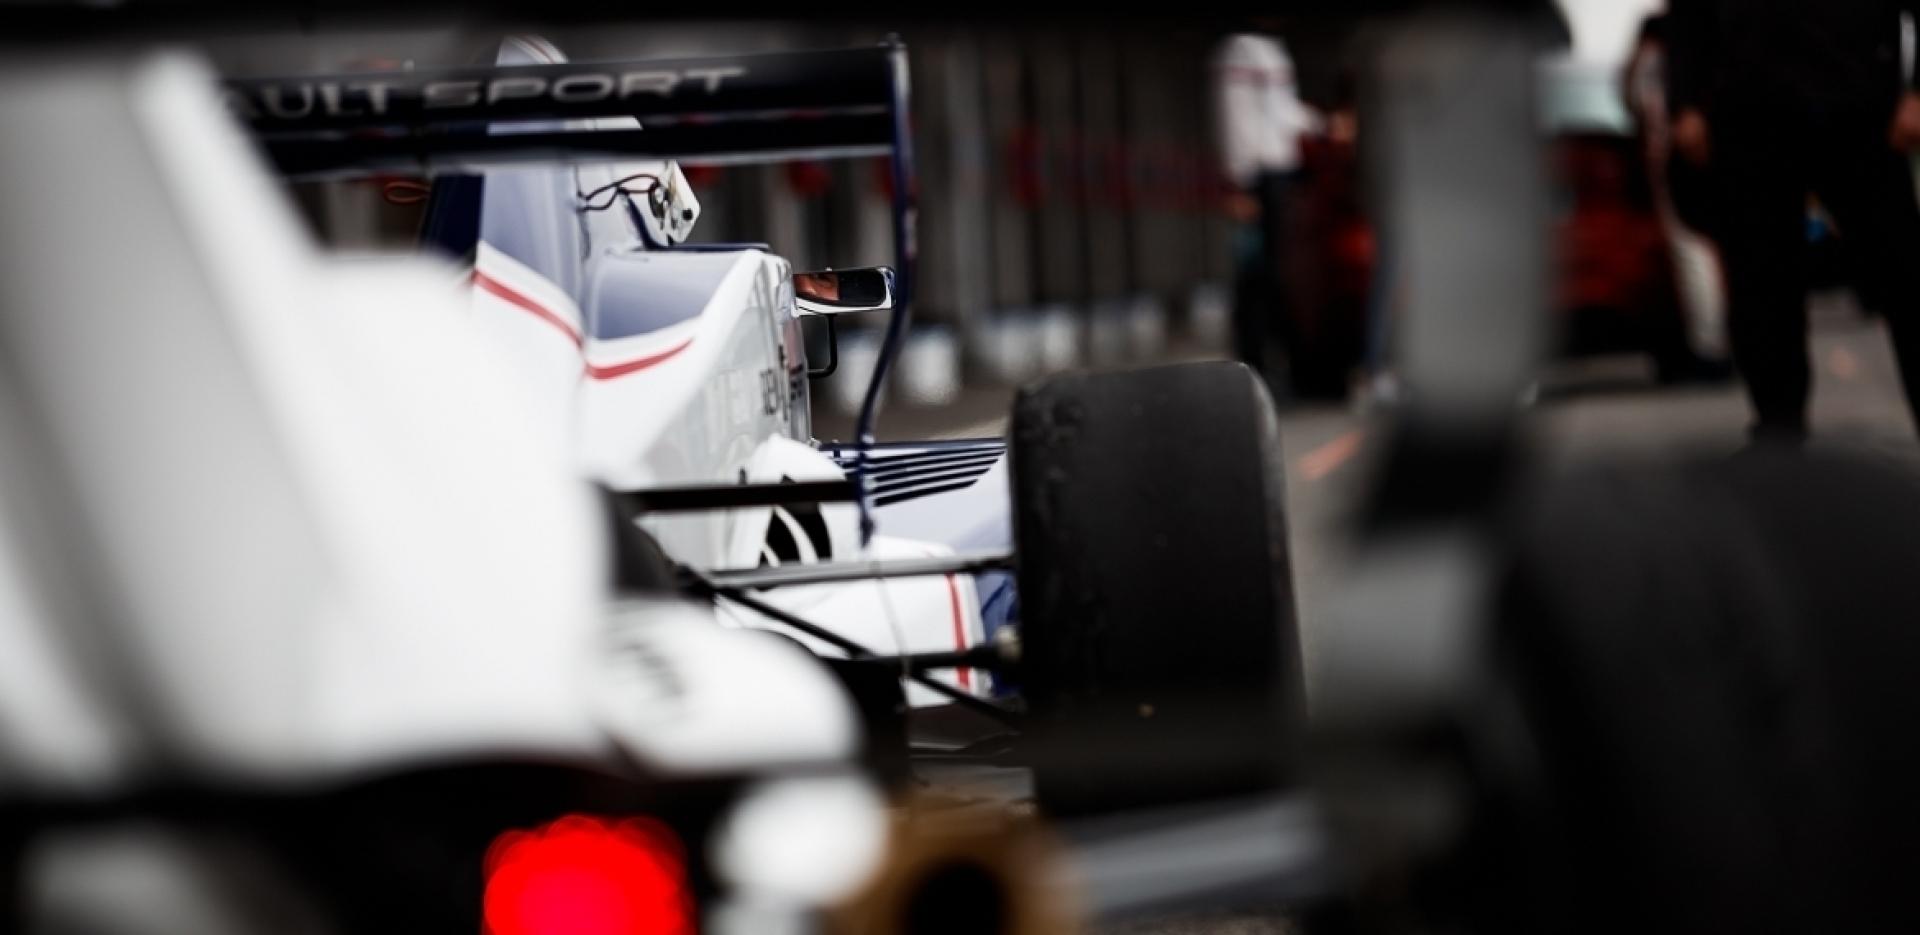 Motorsportfotografie hautnah beim Formelfeeling- exklusiver Trackday am Pannoniaring - Canon Academy Sport